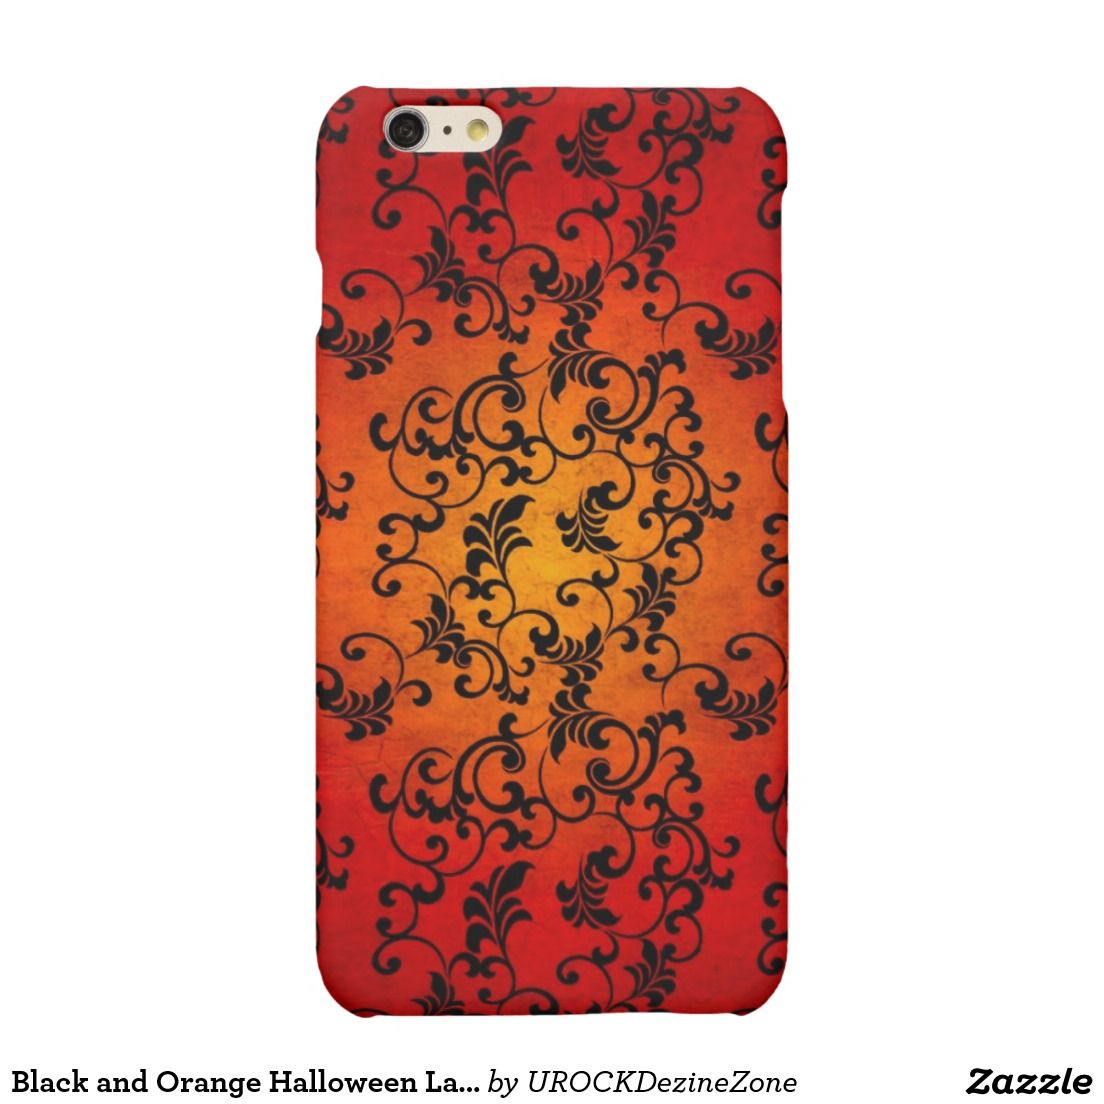 Black and Orange Halloween Lace #iPhone 6 Plus Case  #zazzle